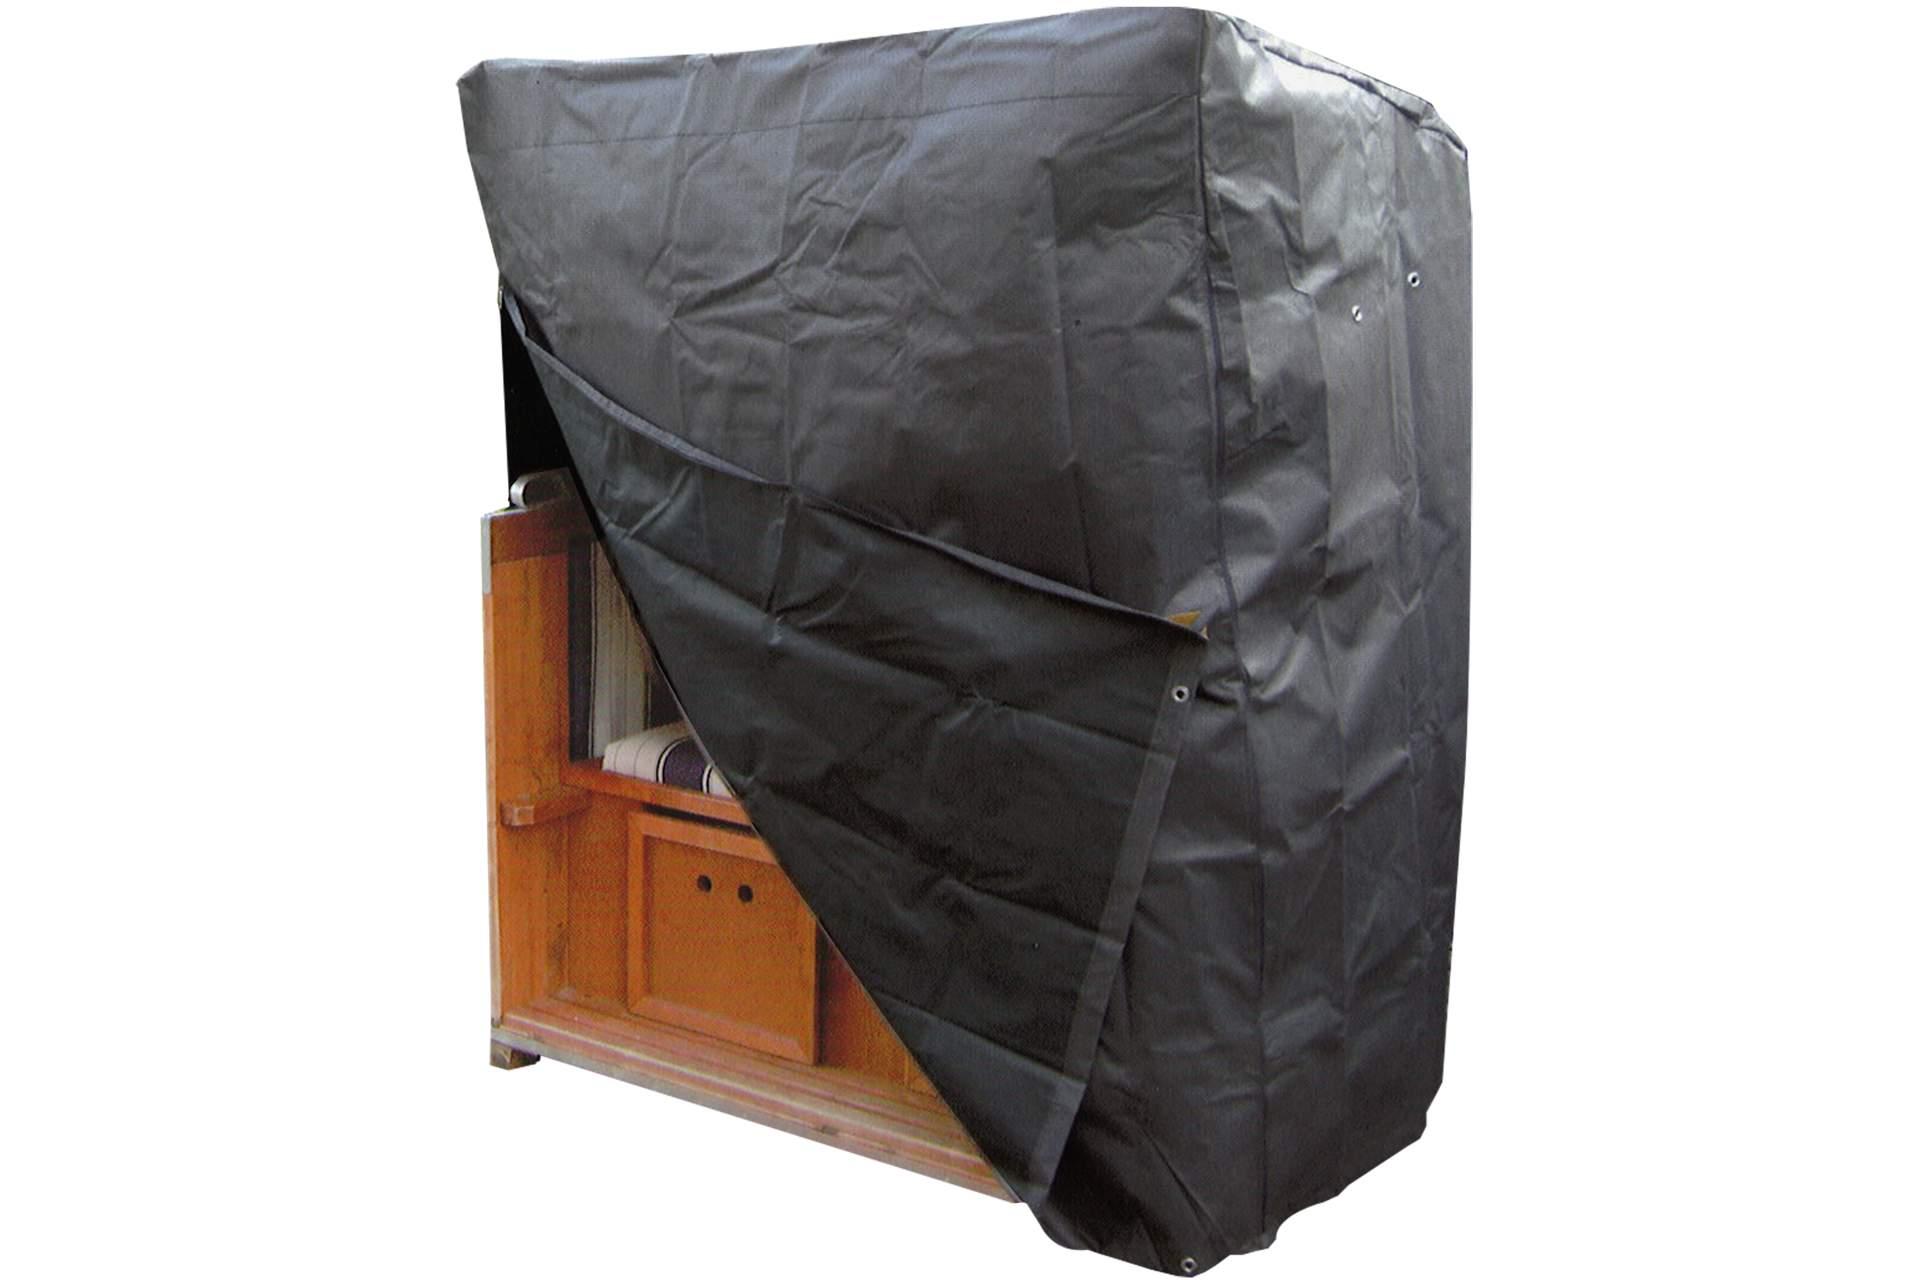 schutzh lle f r strandkorb kynast h lle schutz haube 155cm abdeckung strand korb ebay. Black Bedroom Furniture Sets. Home Design Ideas